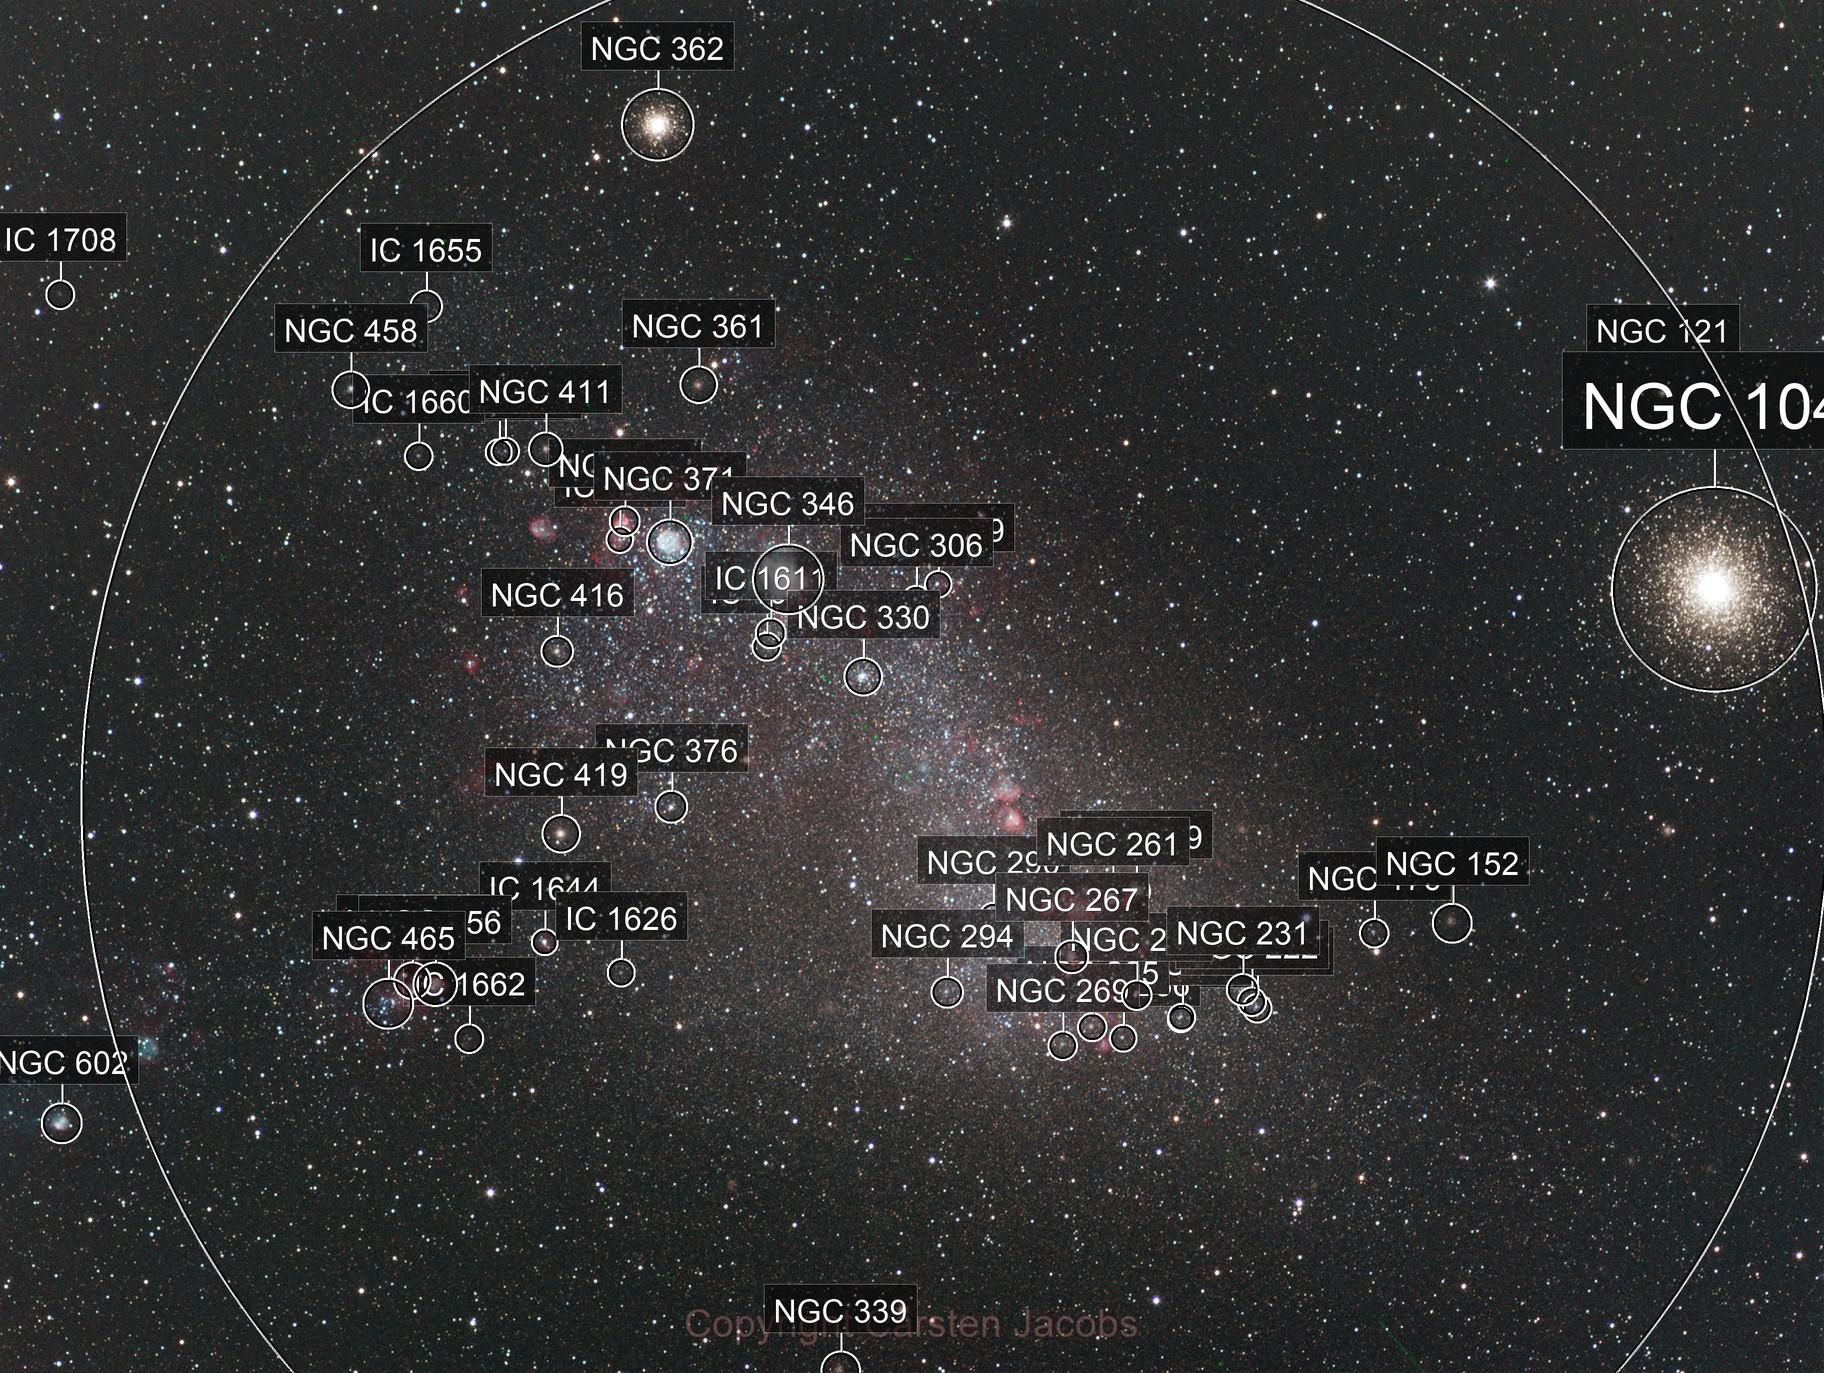 SMC (Small Magellanic Cloud) and 47 Tuc